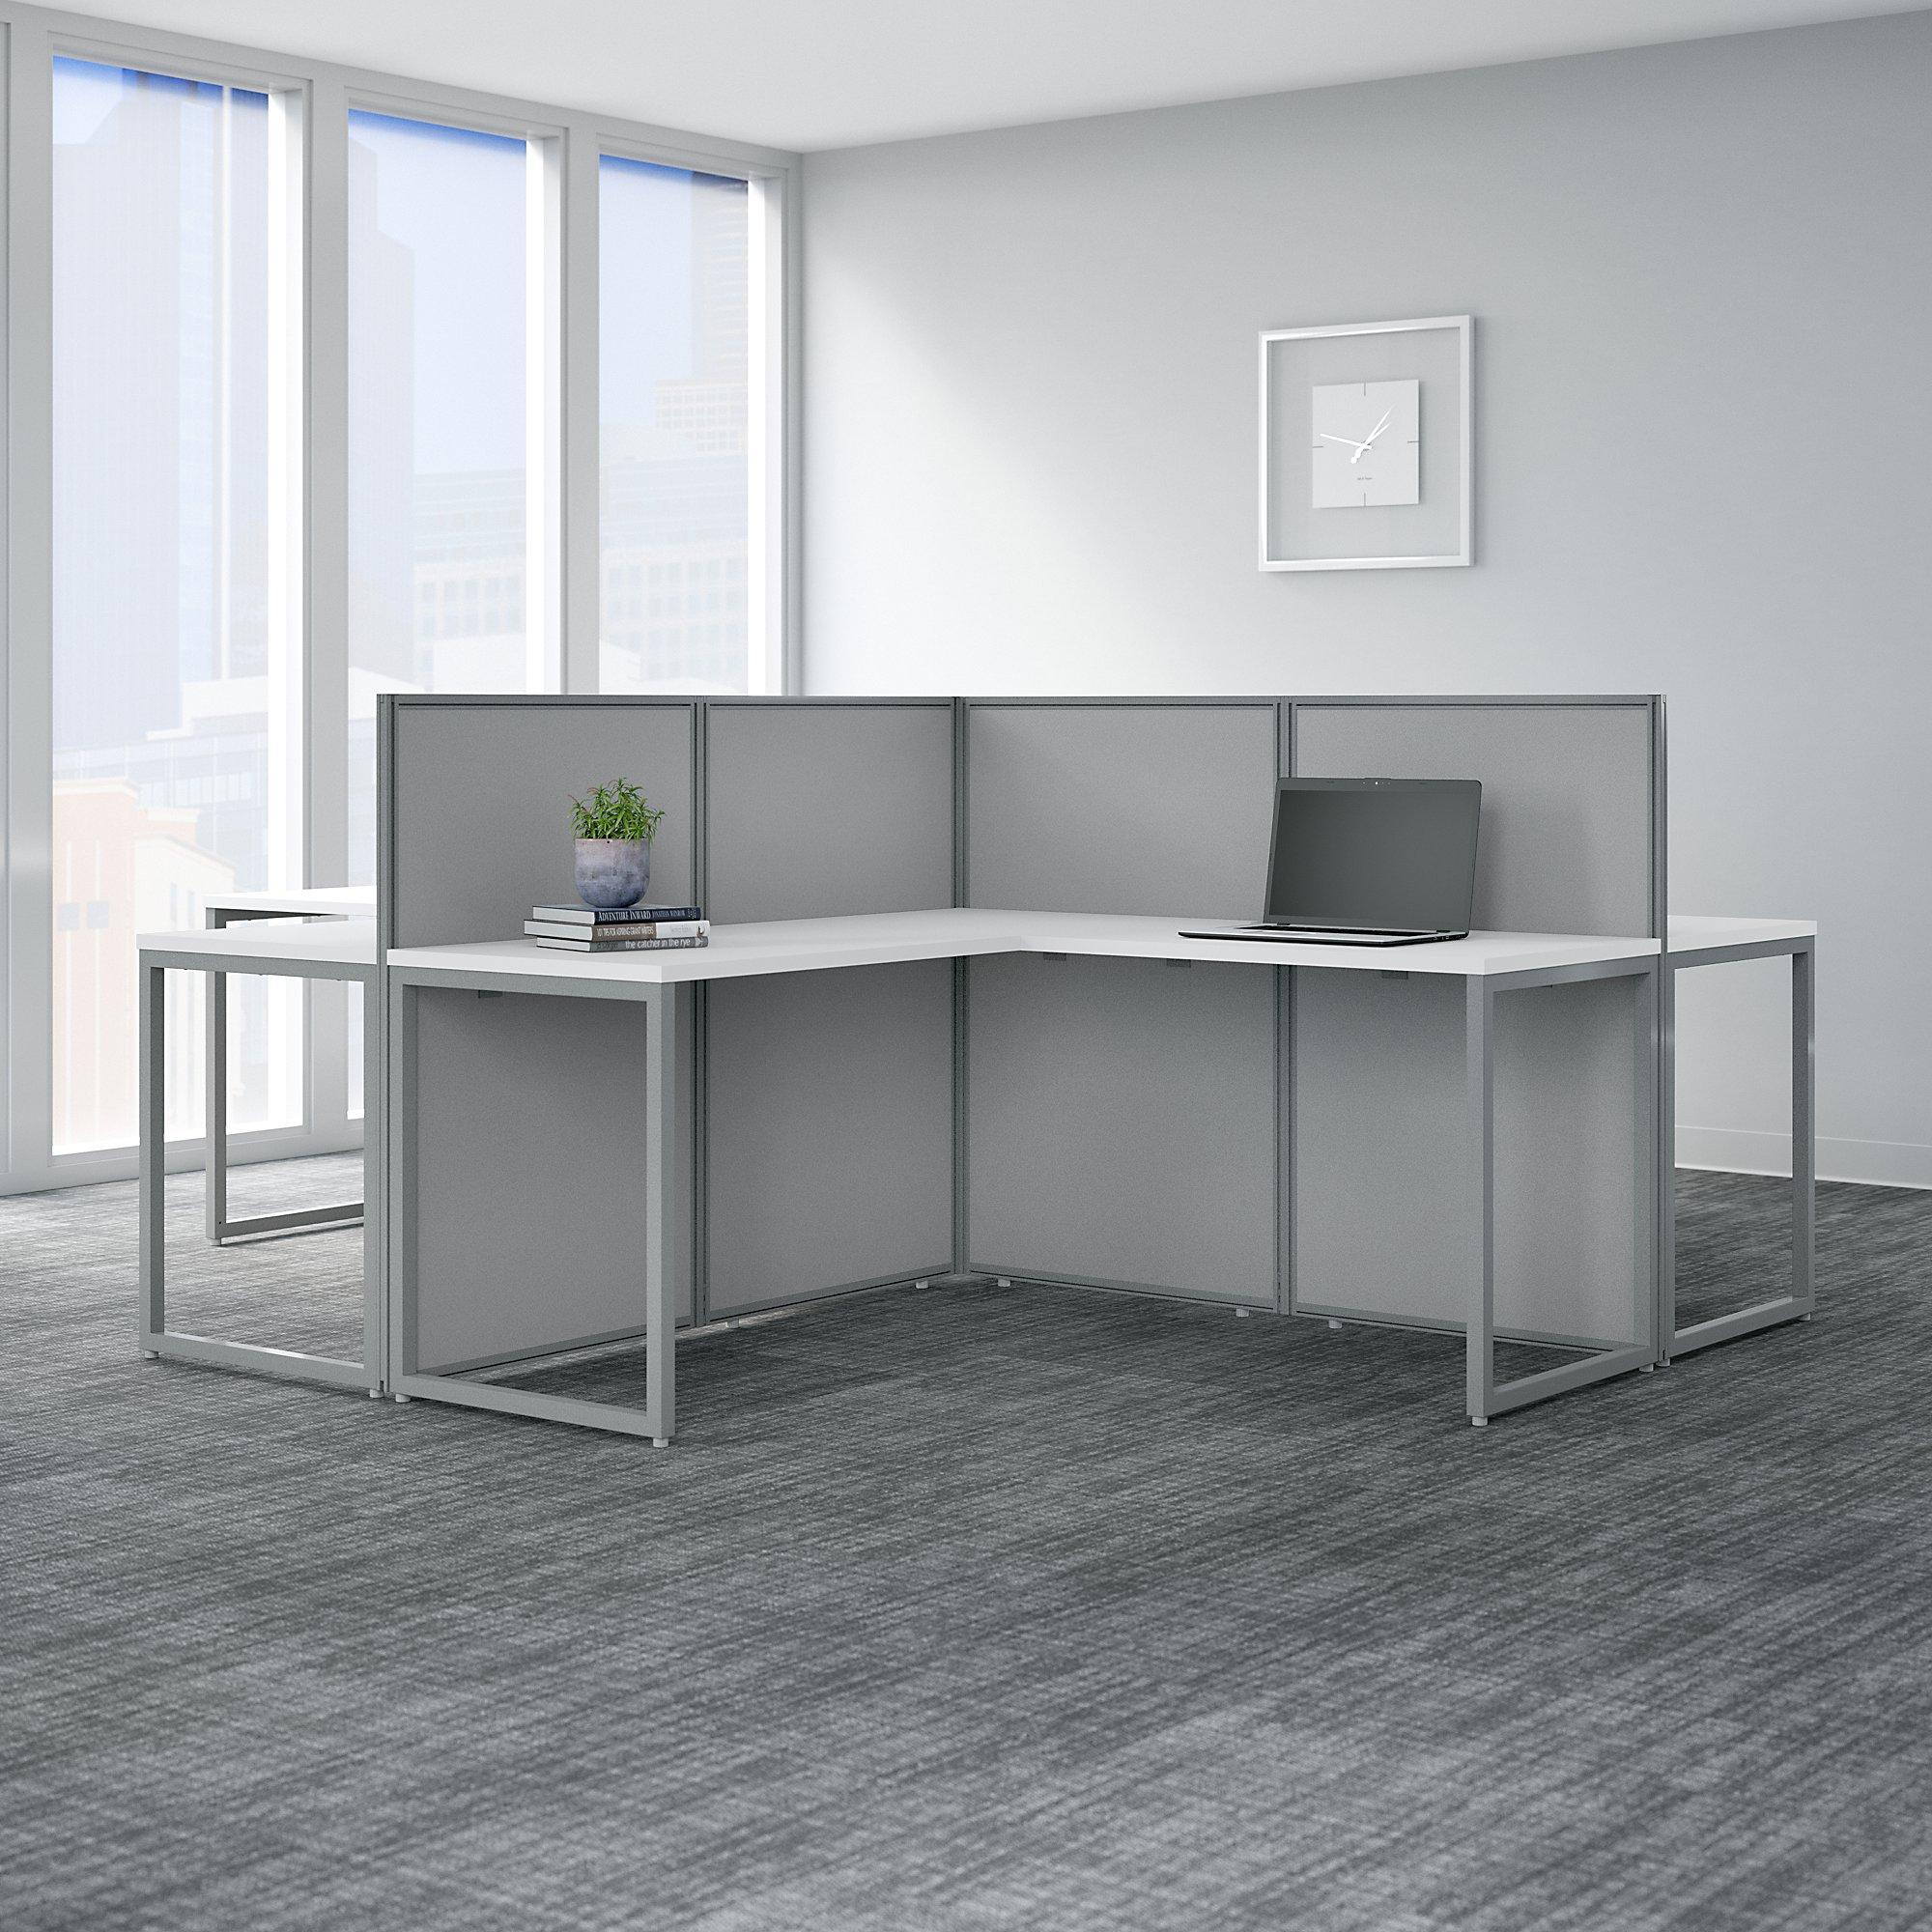 4 person cubicle configuration